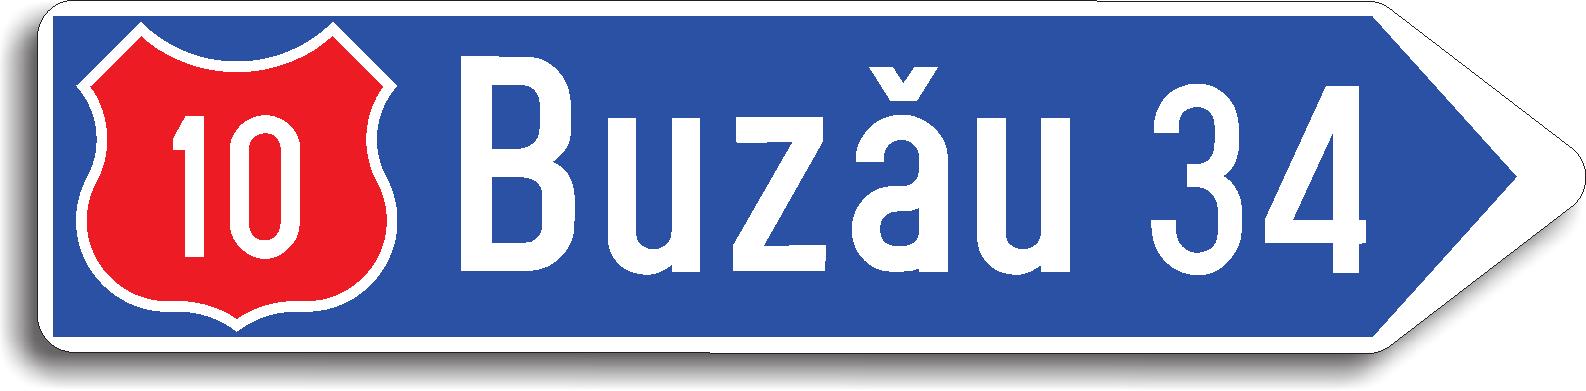 Directia spre localitatea indicata